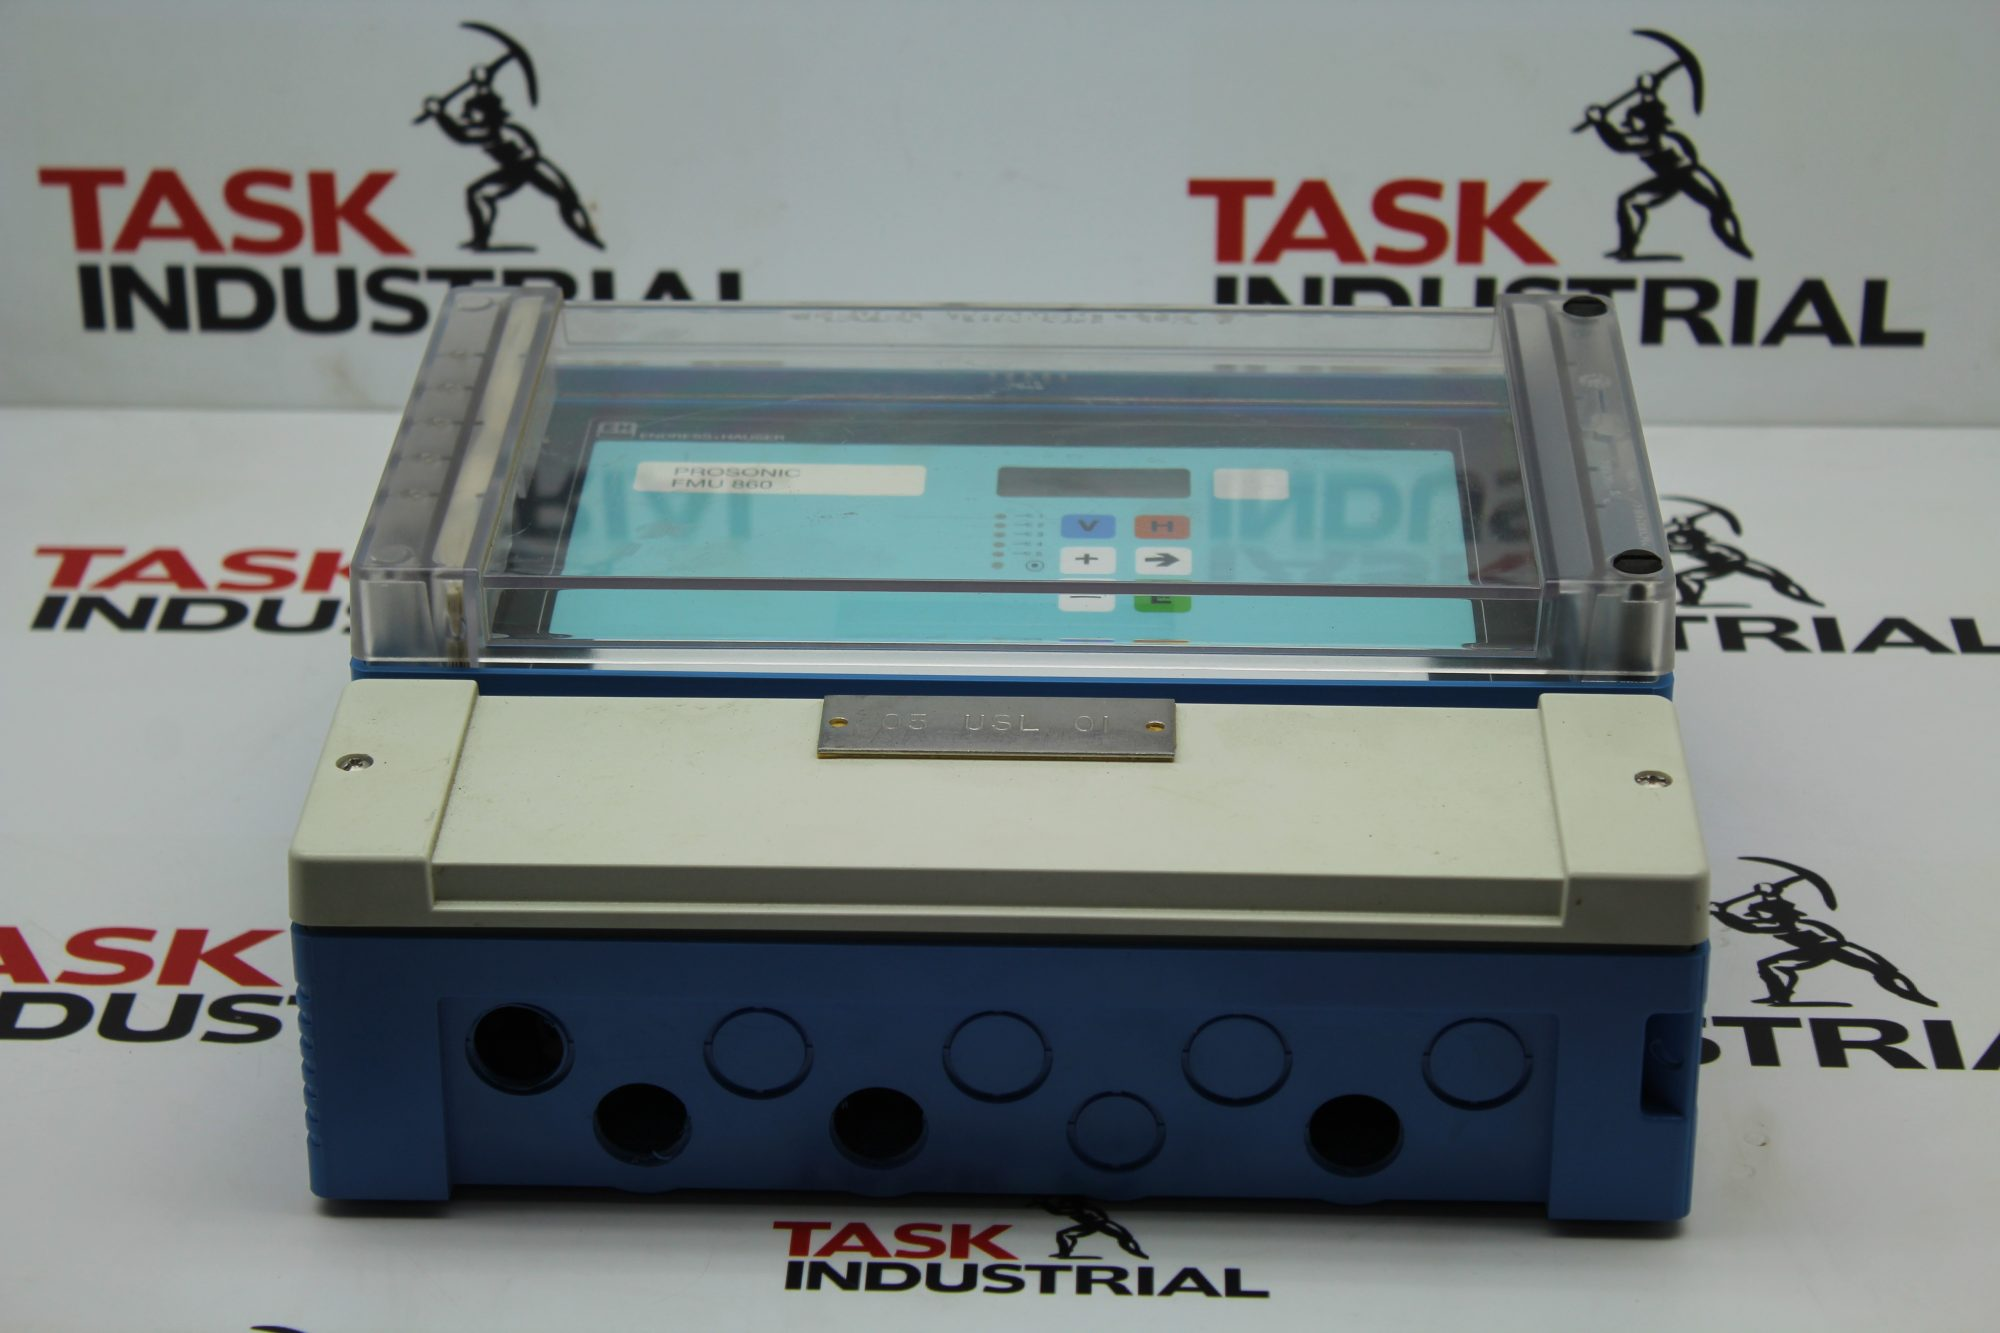 Endress+Hauser Prosonic FMU 860 FMU860-R1E1B8